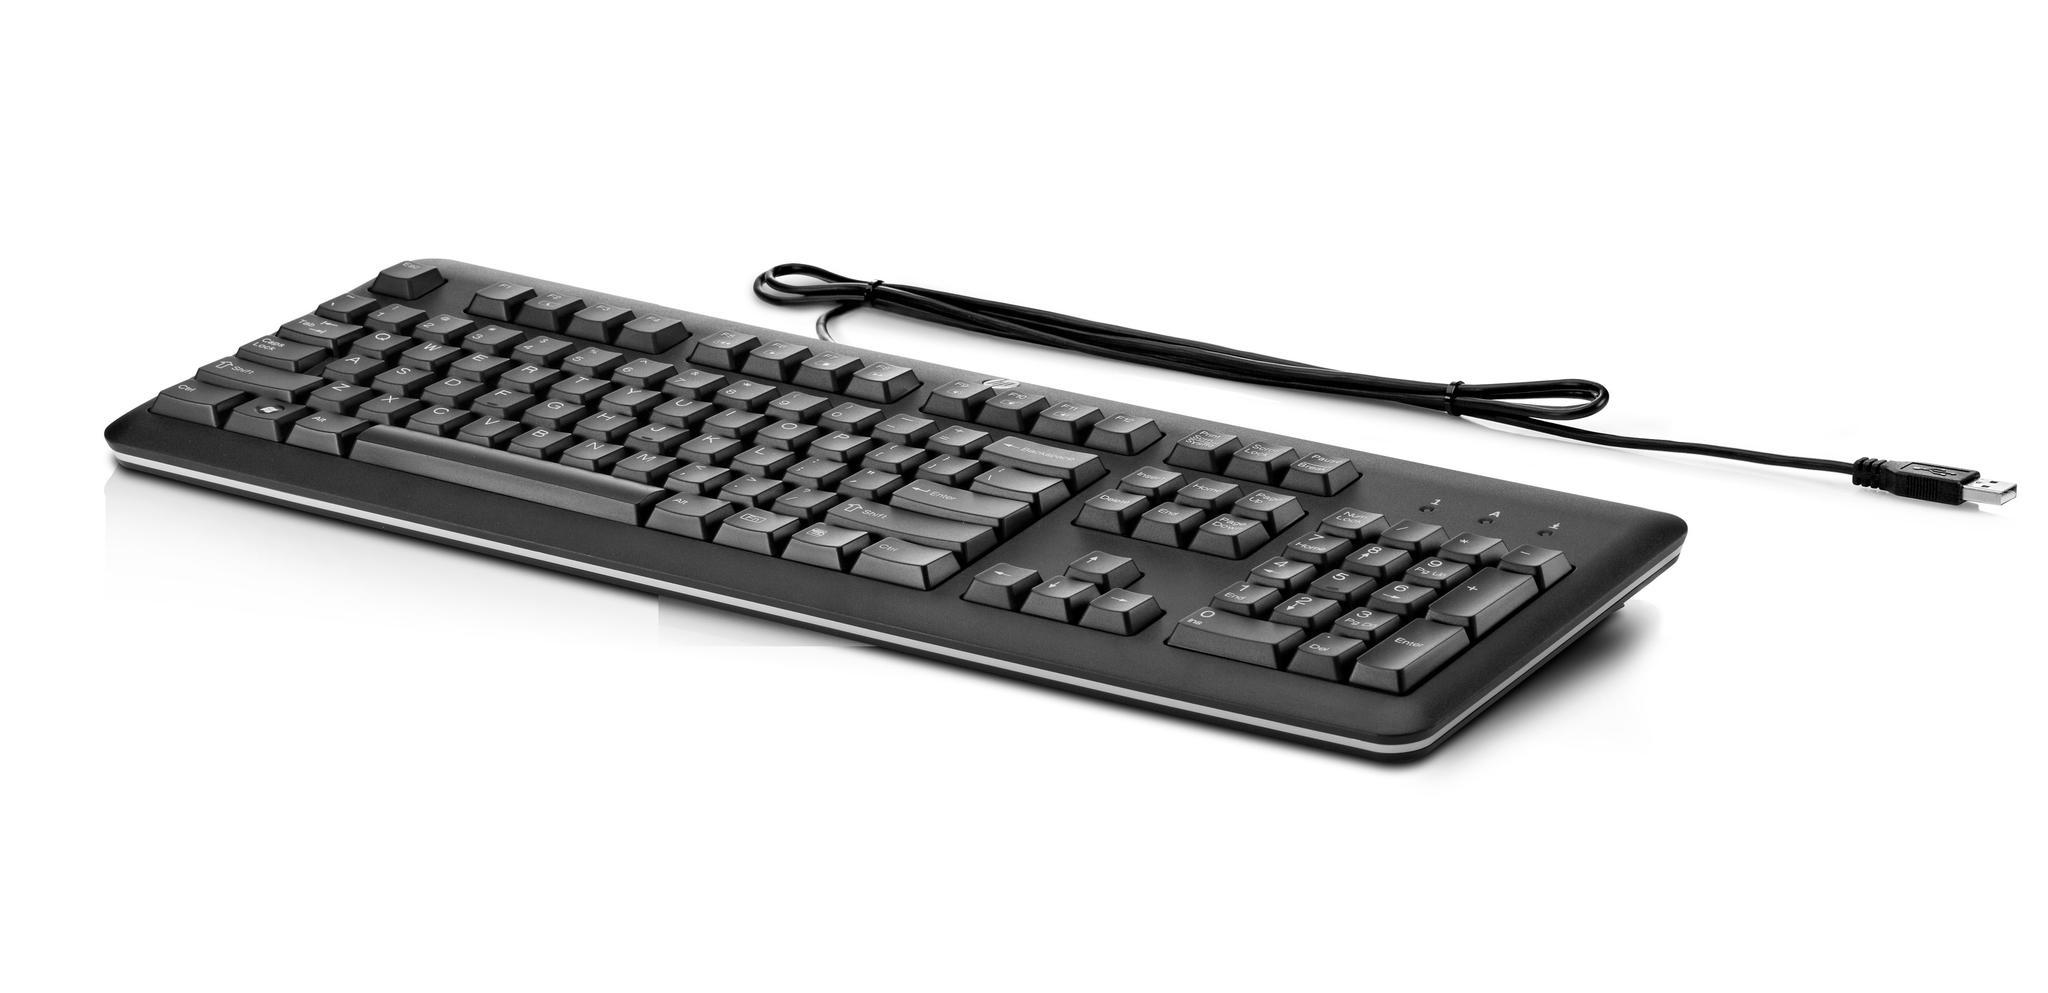 HP USB toetsenbord US QY776AA